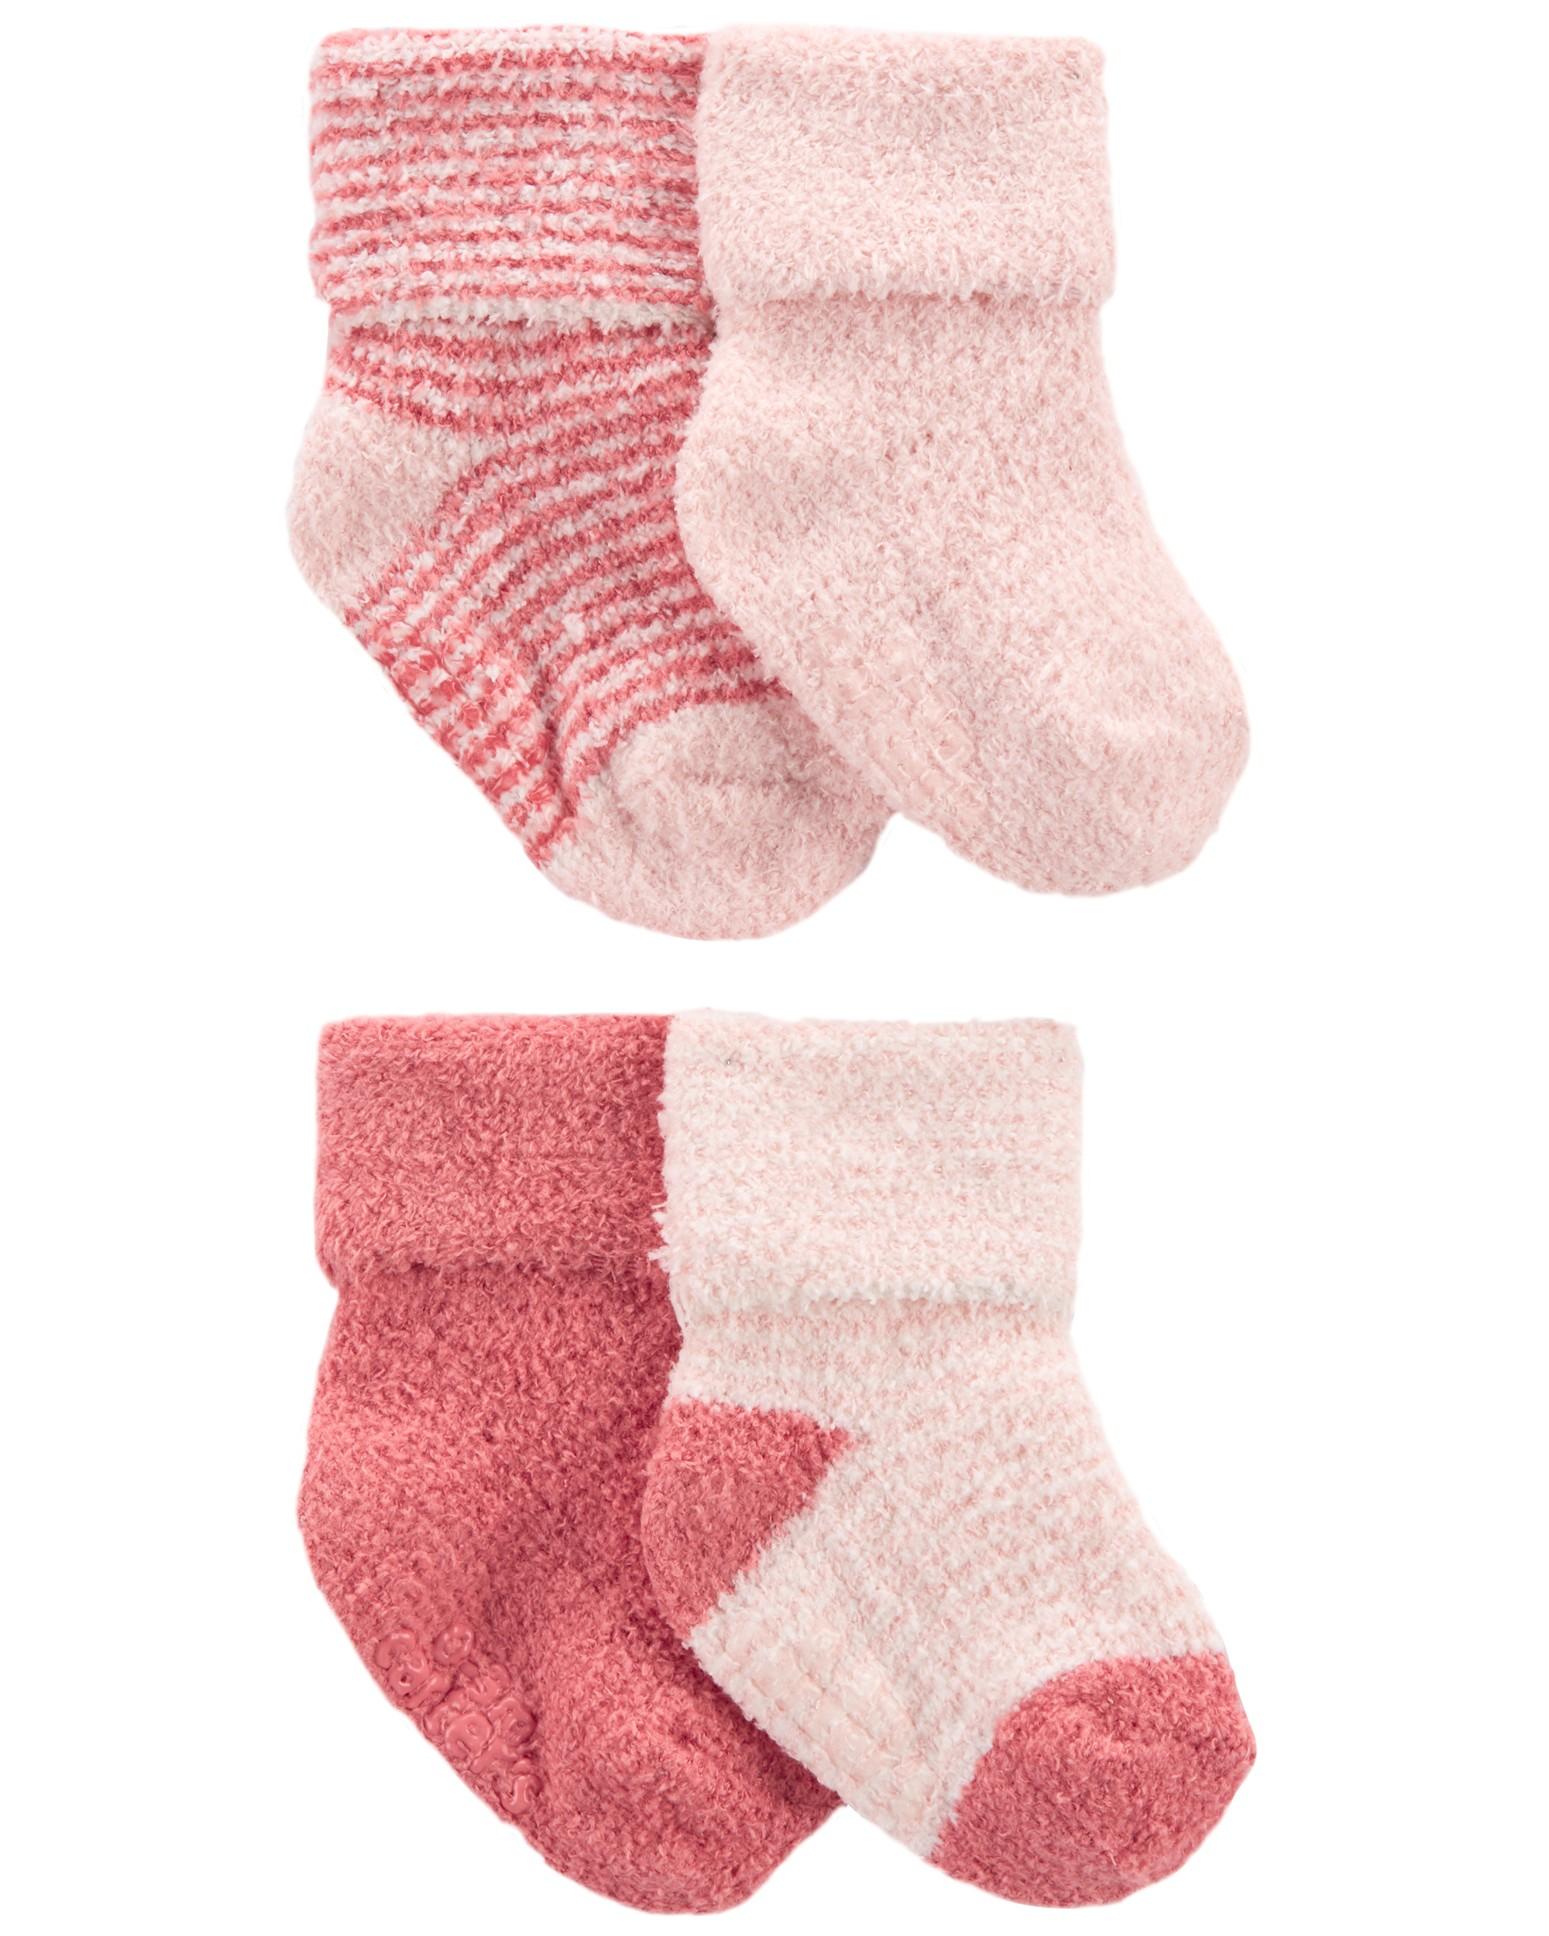 CARTER'S Ponožky Stripes Pink dievča LBB 4ks 0-3m